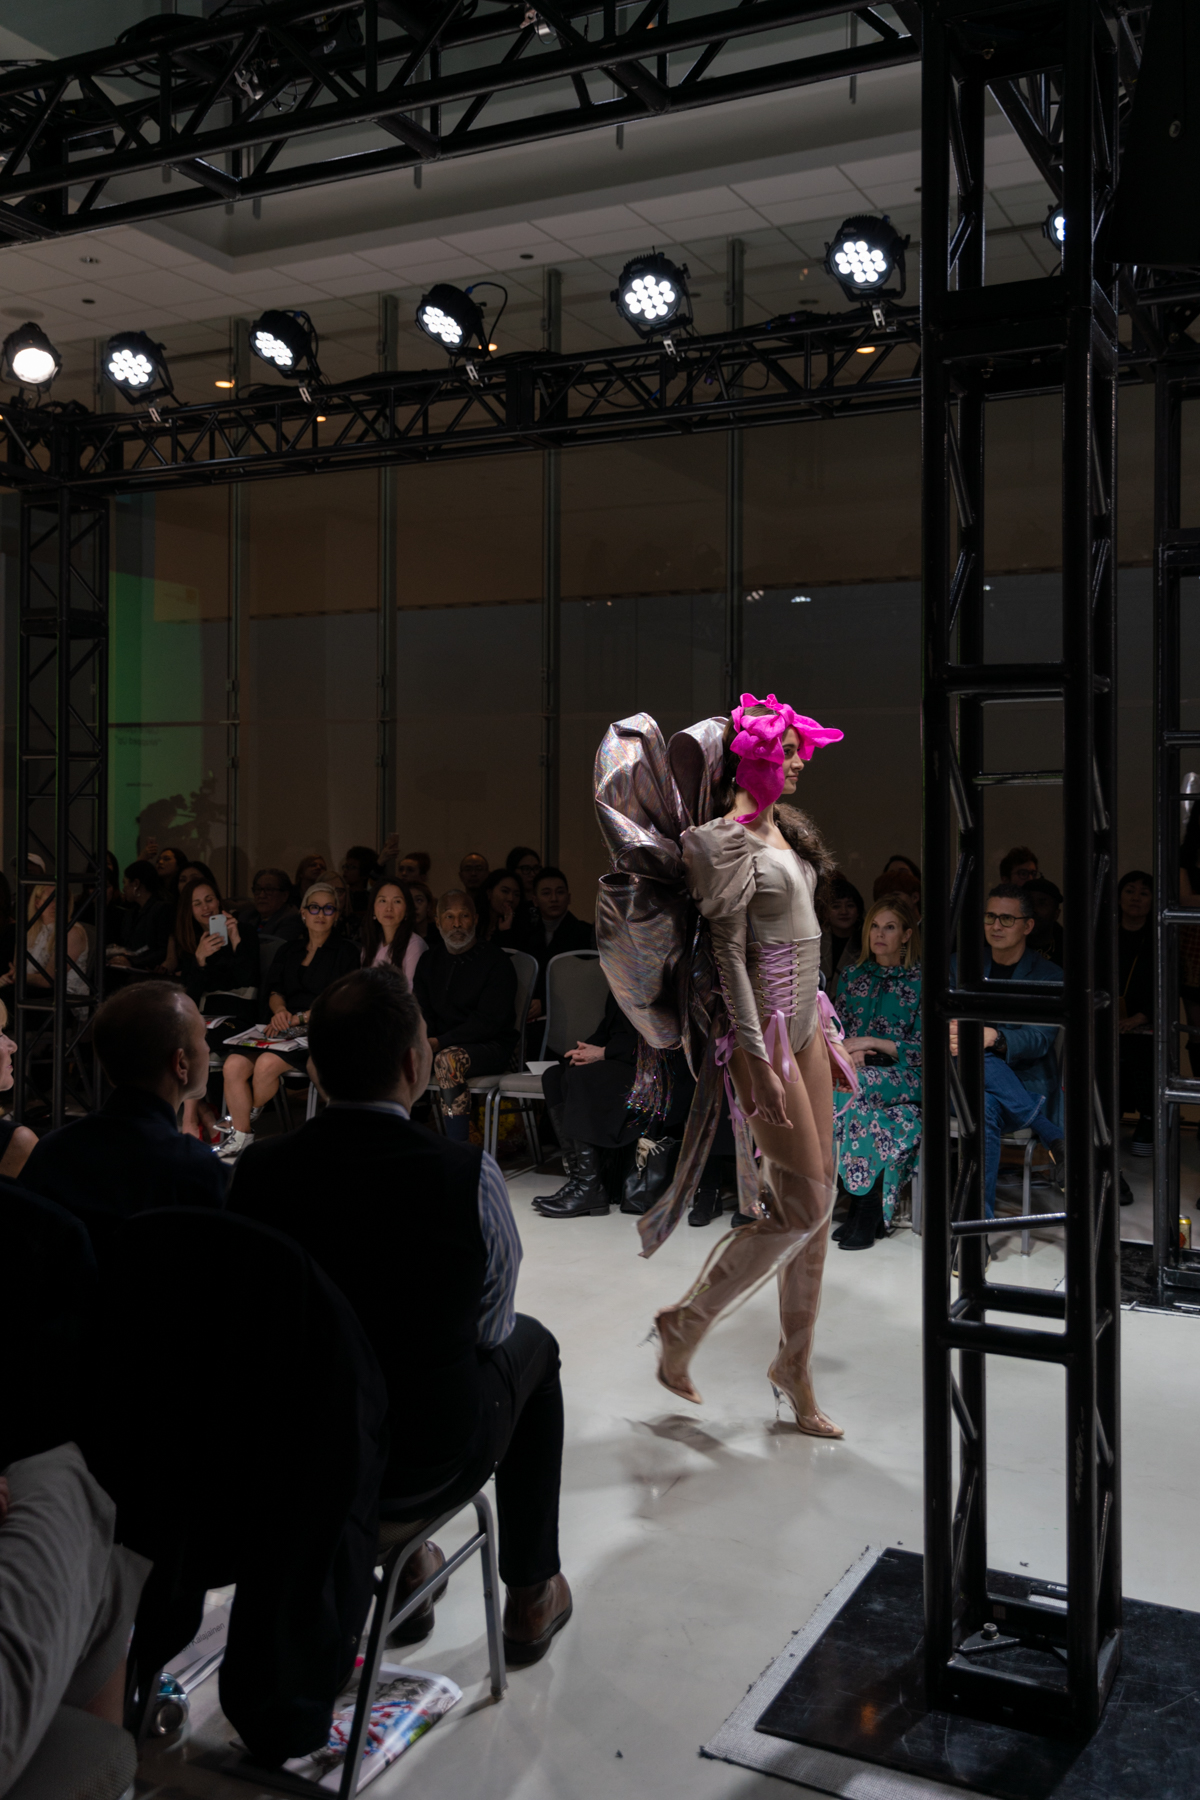 connor_fenwick_saic_fashion_event_lyons_04.jpg